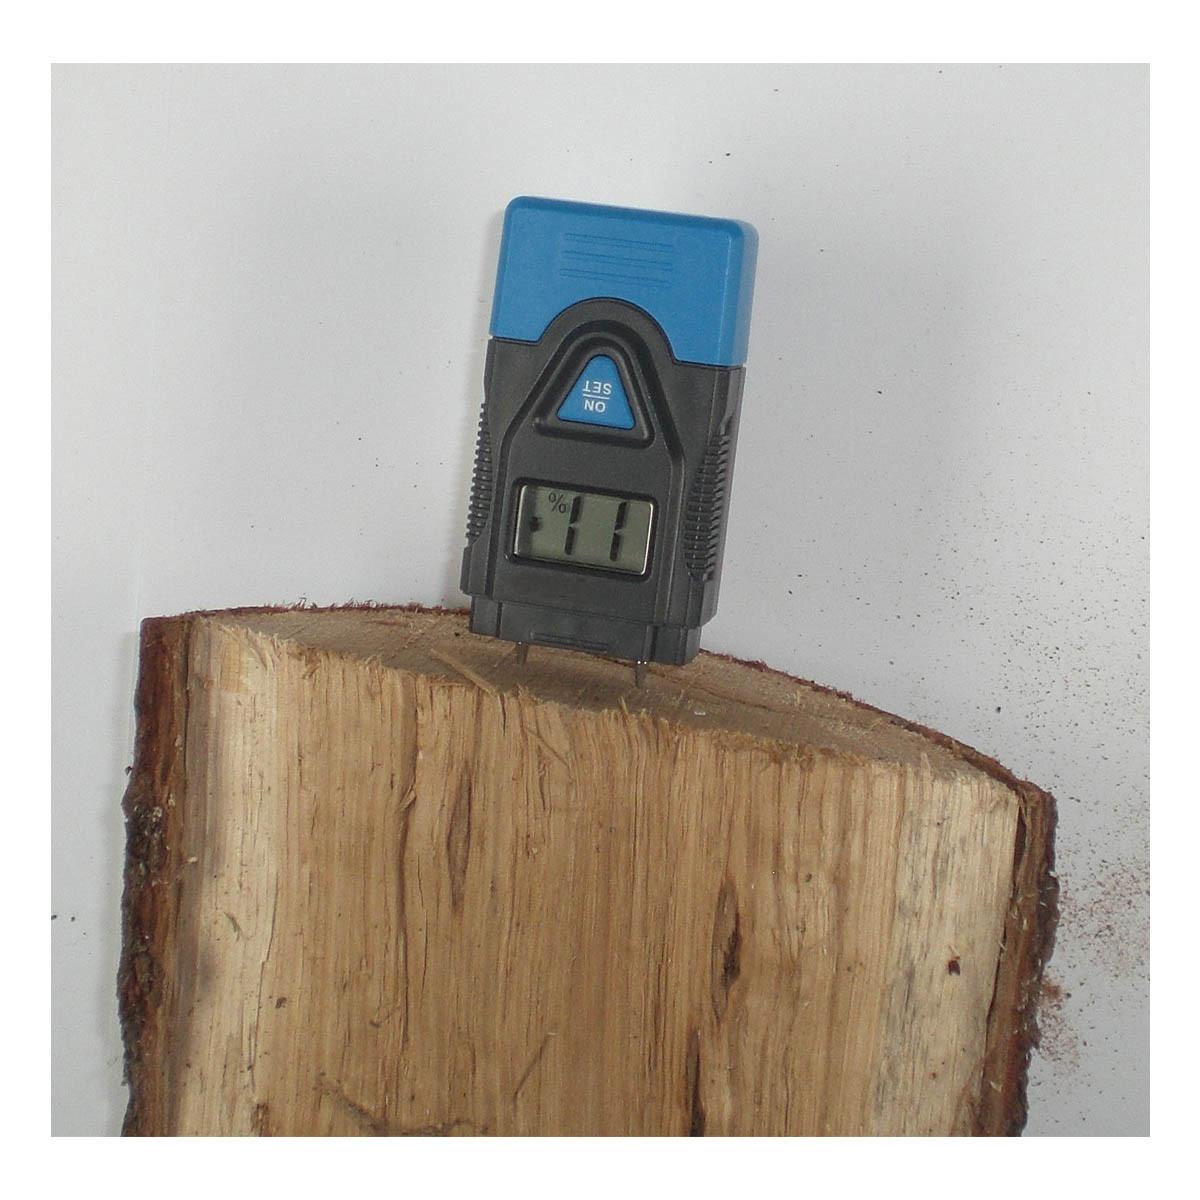 30-5502-materialfeuchtemessgerät-humidcheck-mini-anwendung-1200x1200px.jpg